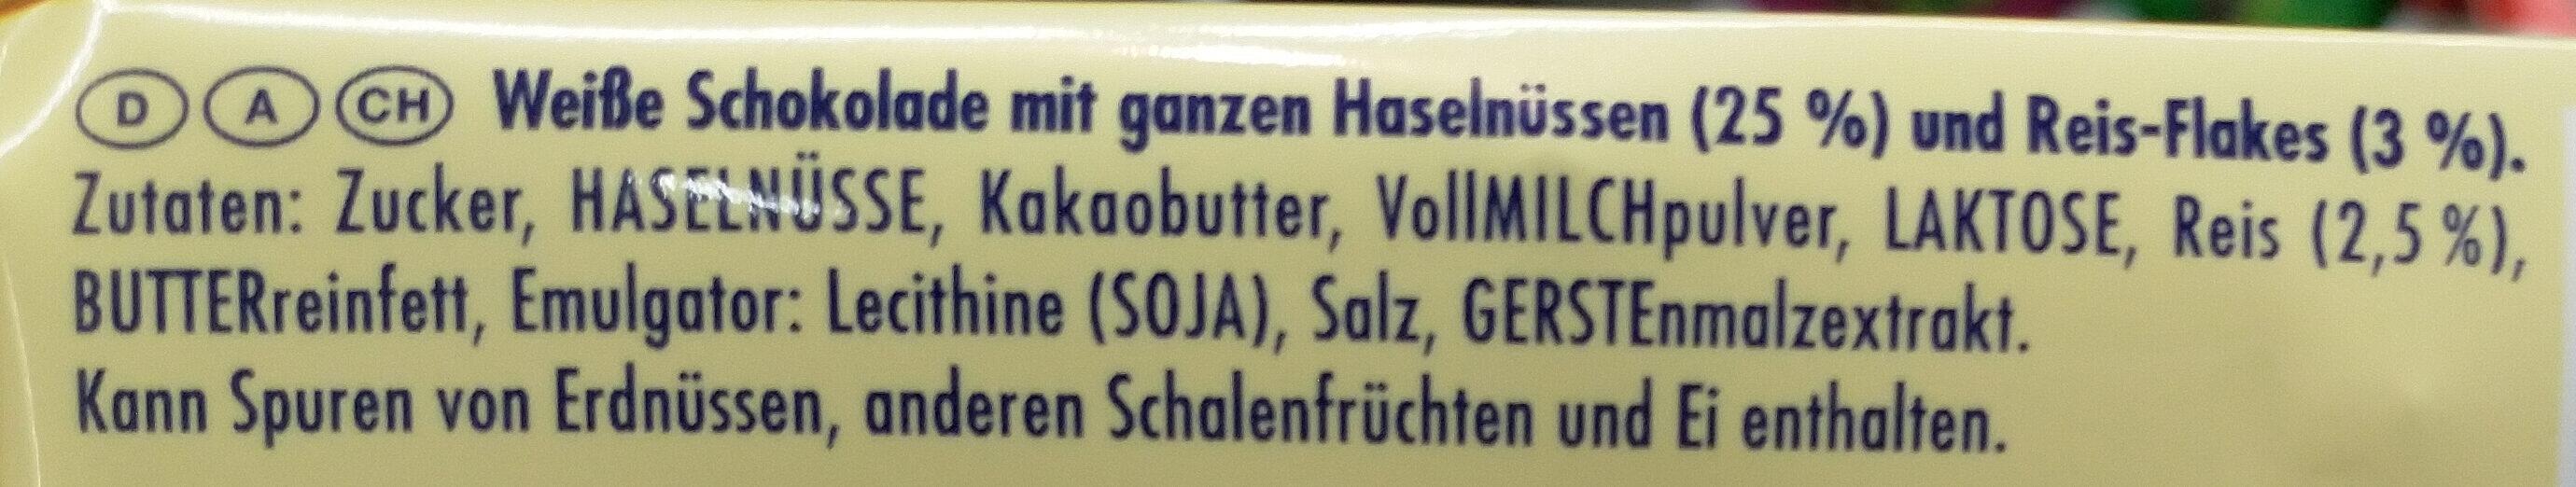 Weisse Voll-Nuss - Inhaltsstoffe - de